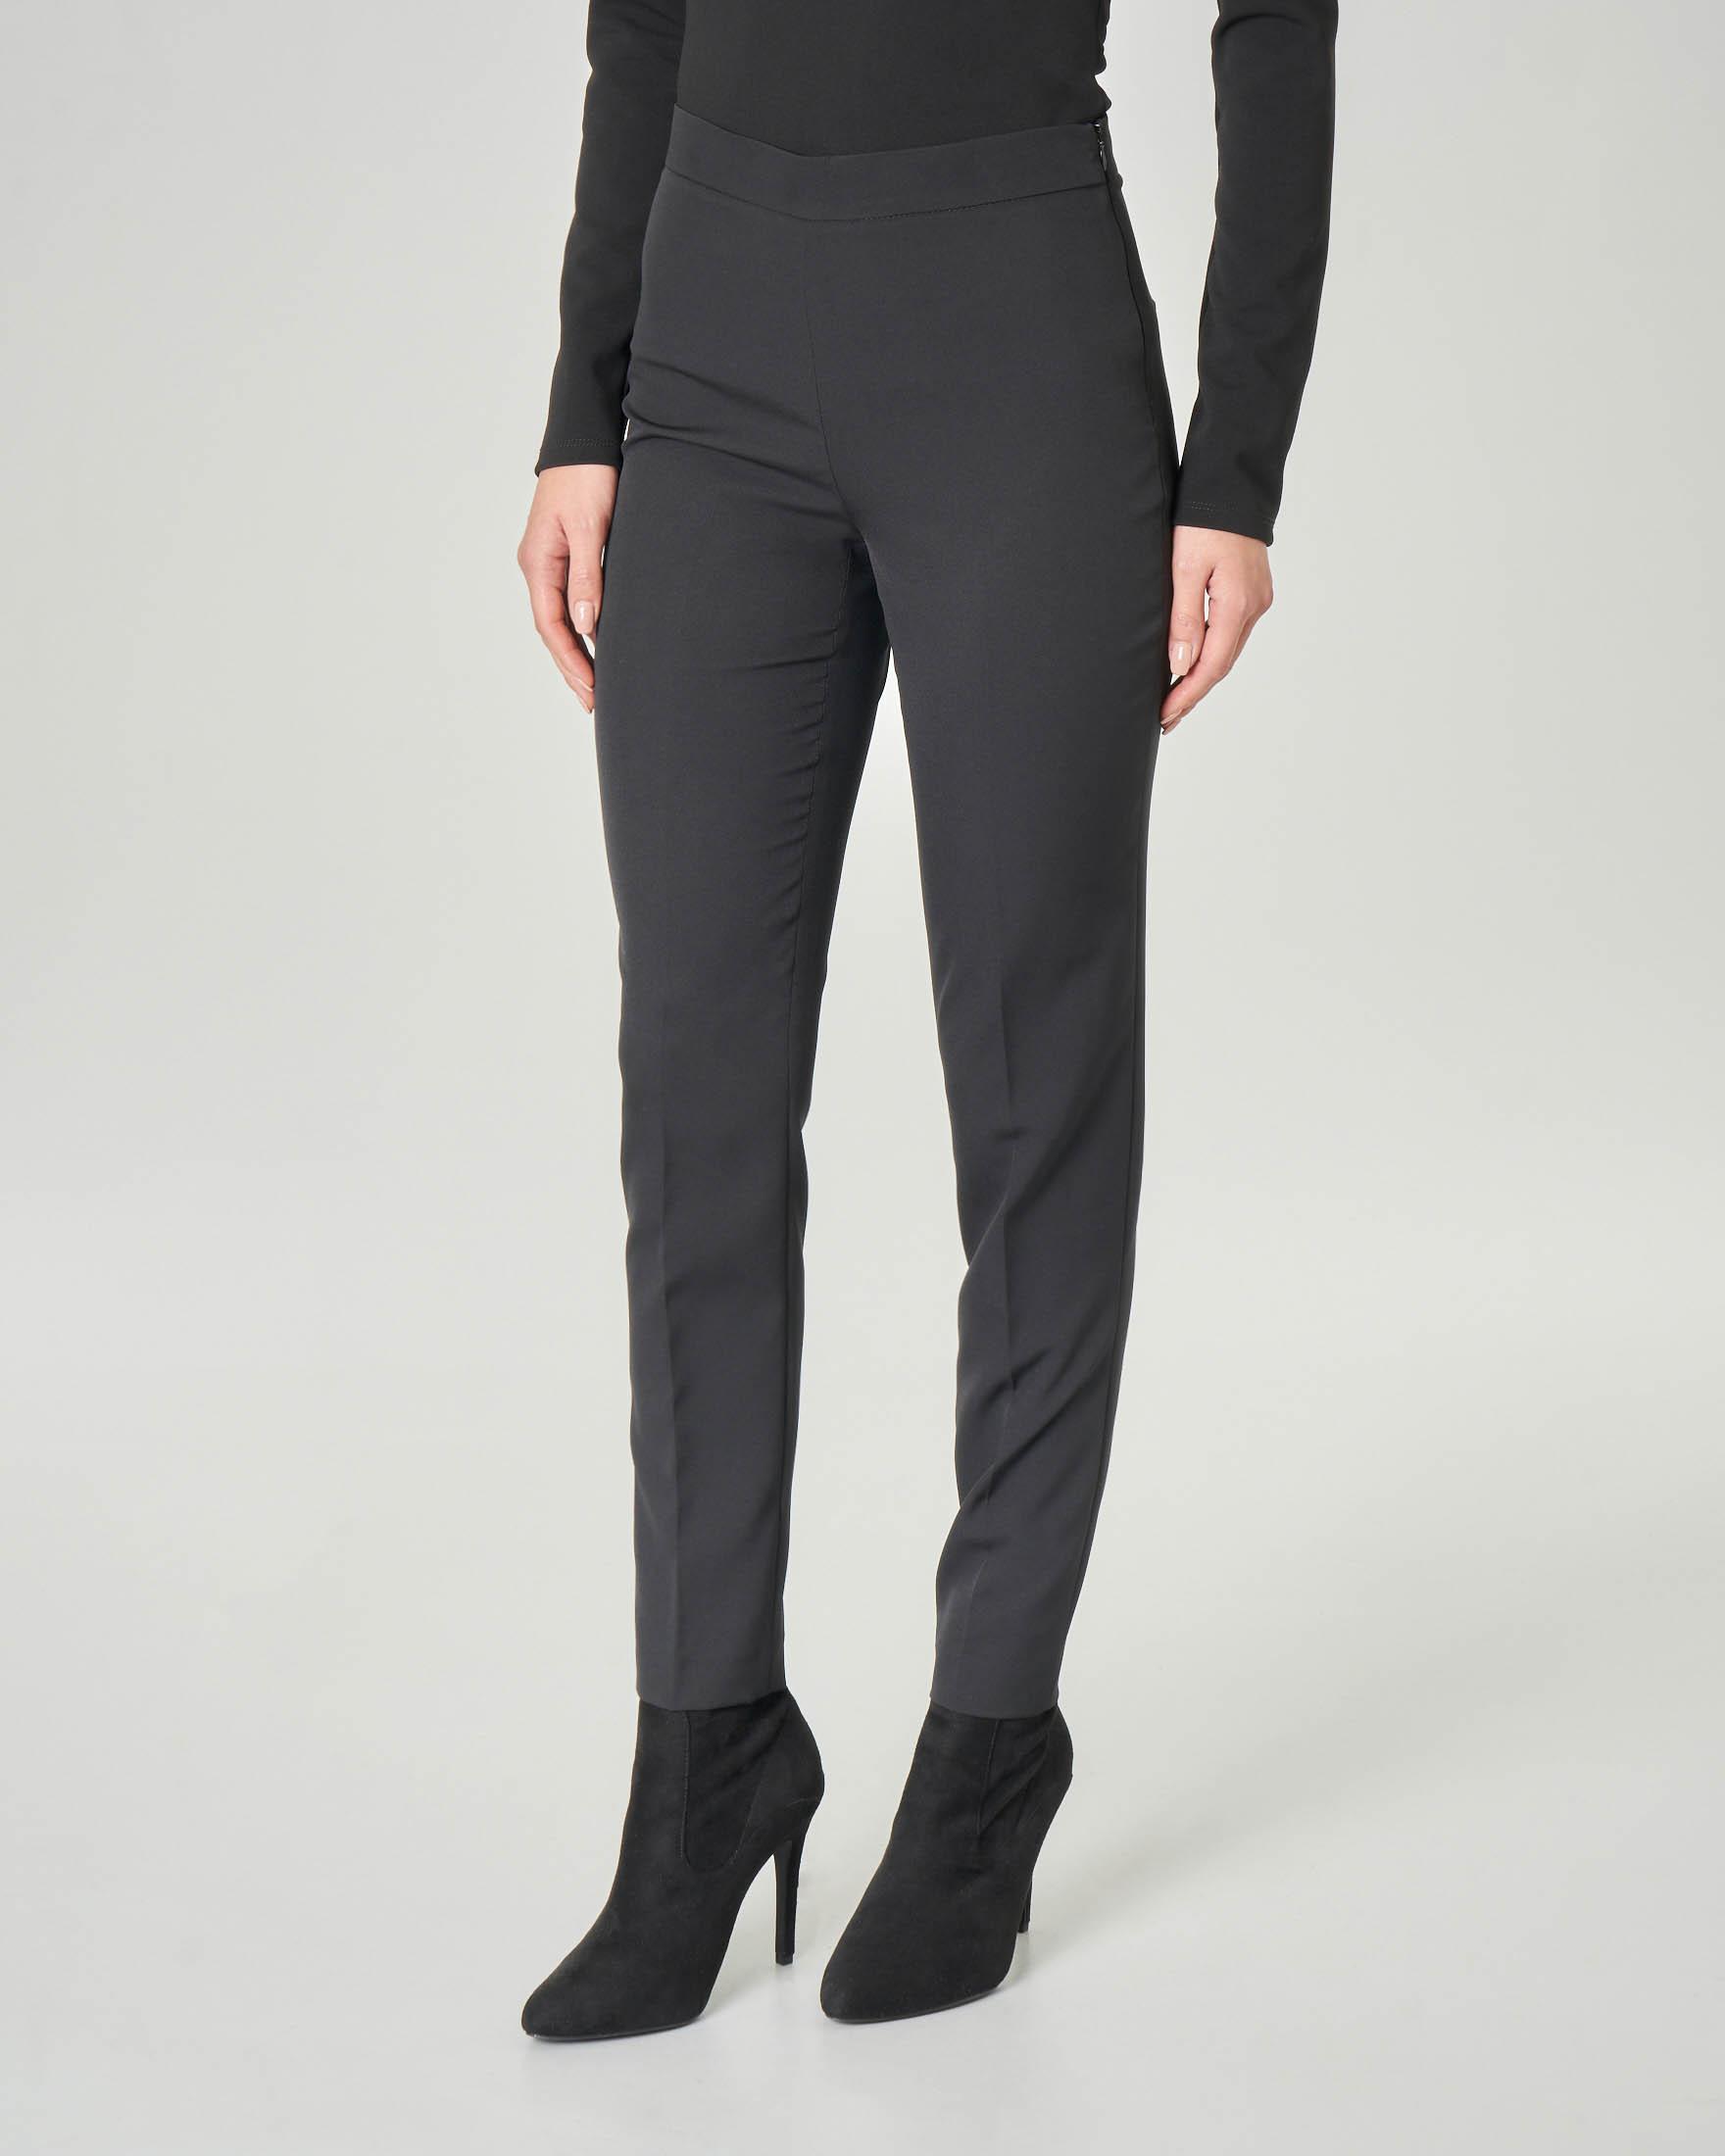 Pantaloni dritti neri in tessuto tecnico